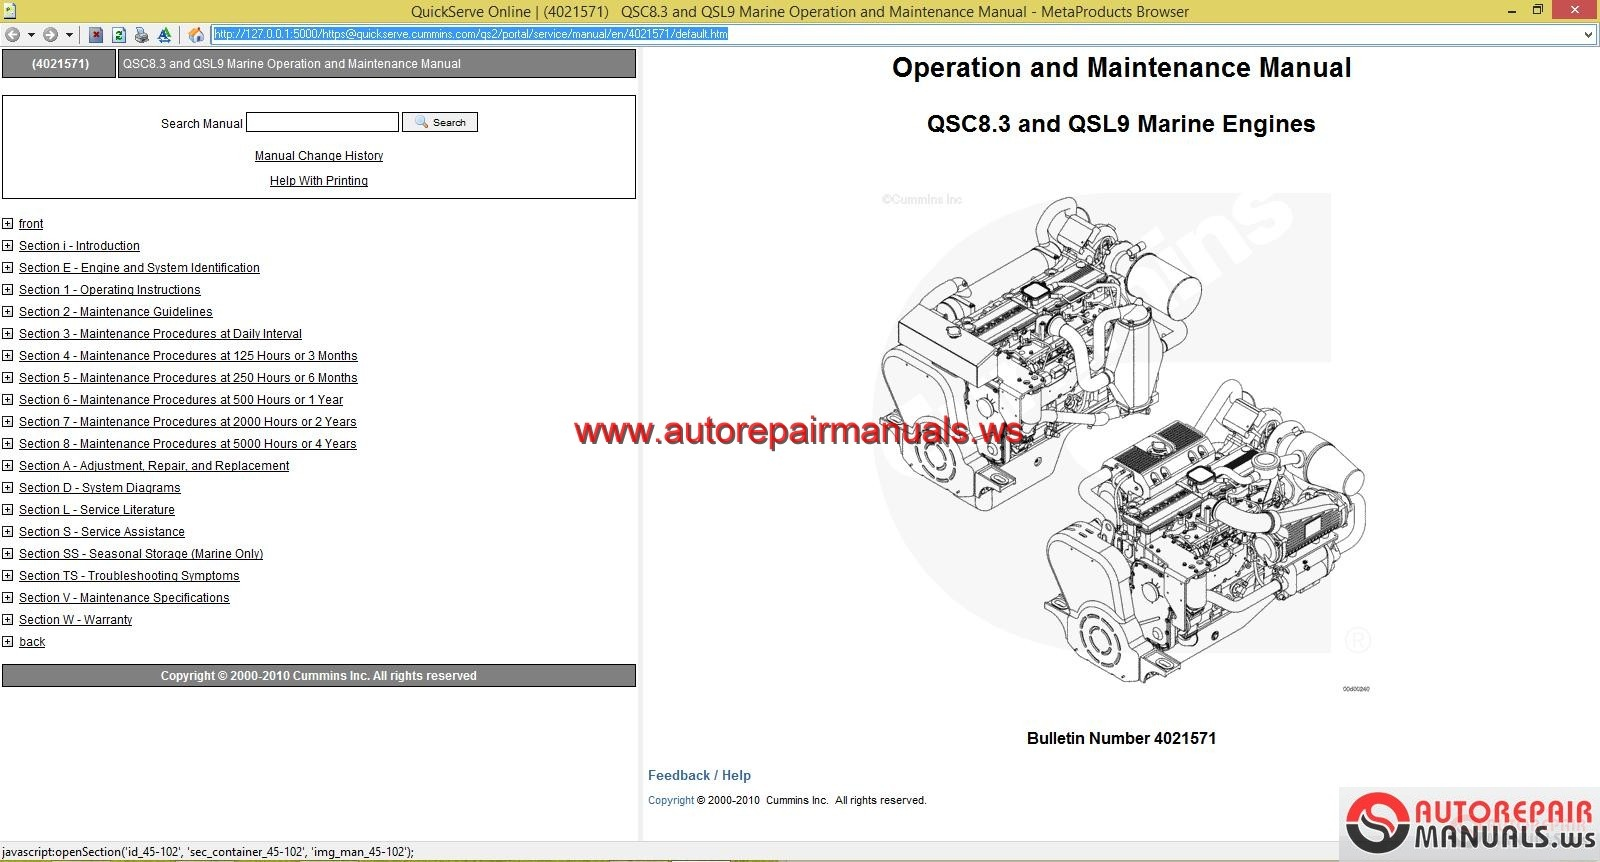 Cummins Qsc8 3 And Qsl9 Service Manual